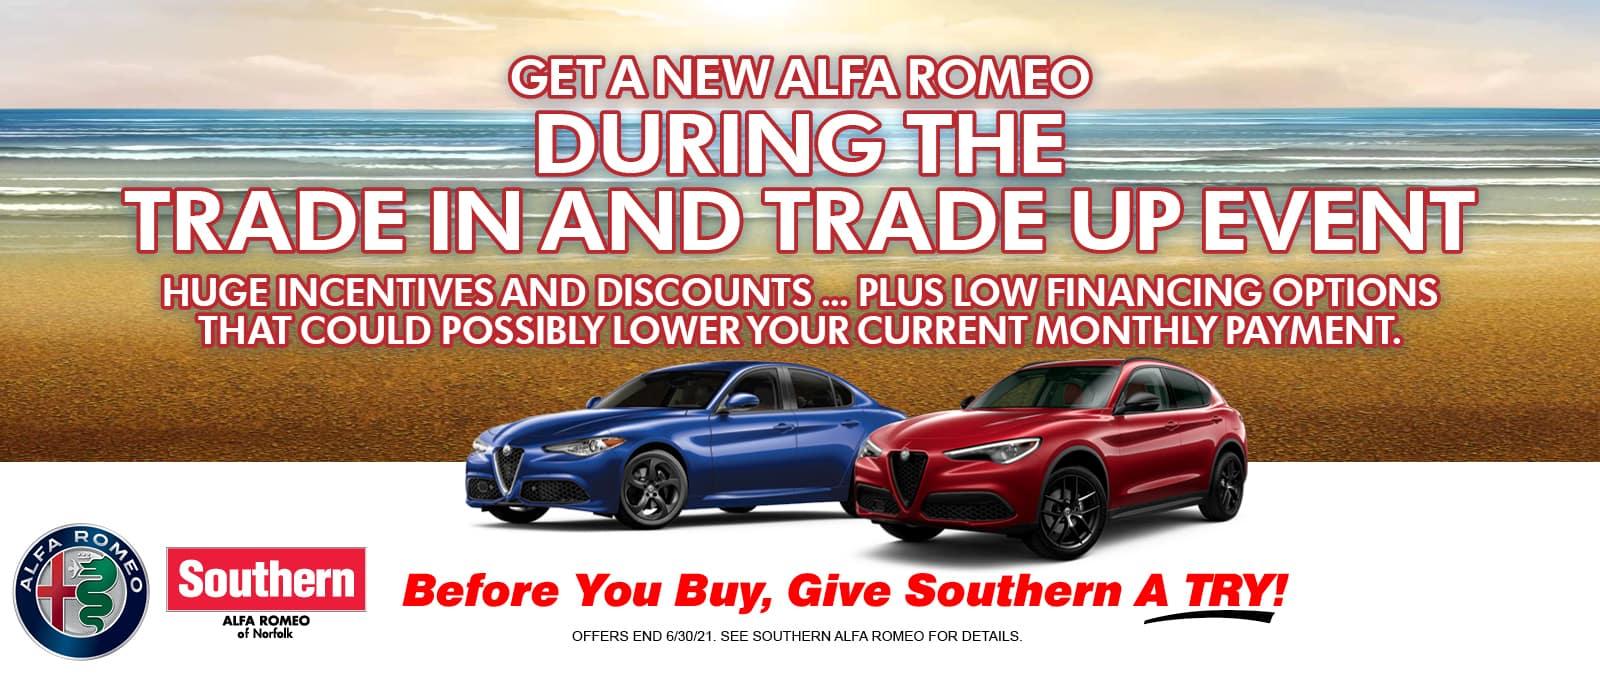 Southern Alfa Romeo Trade-In and Trade-Up